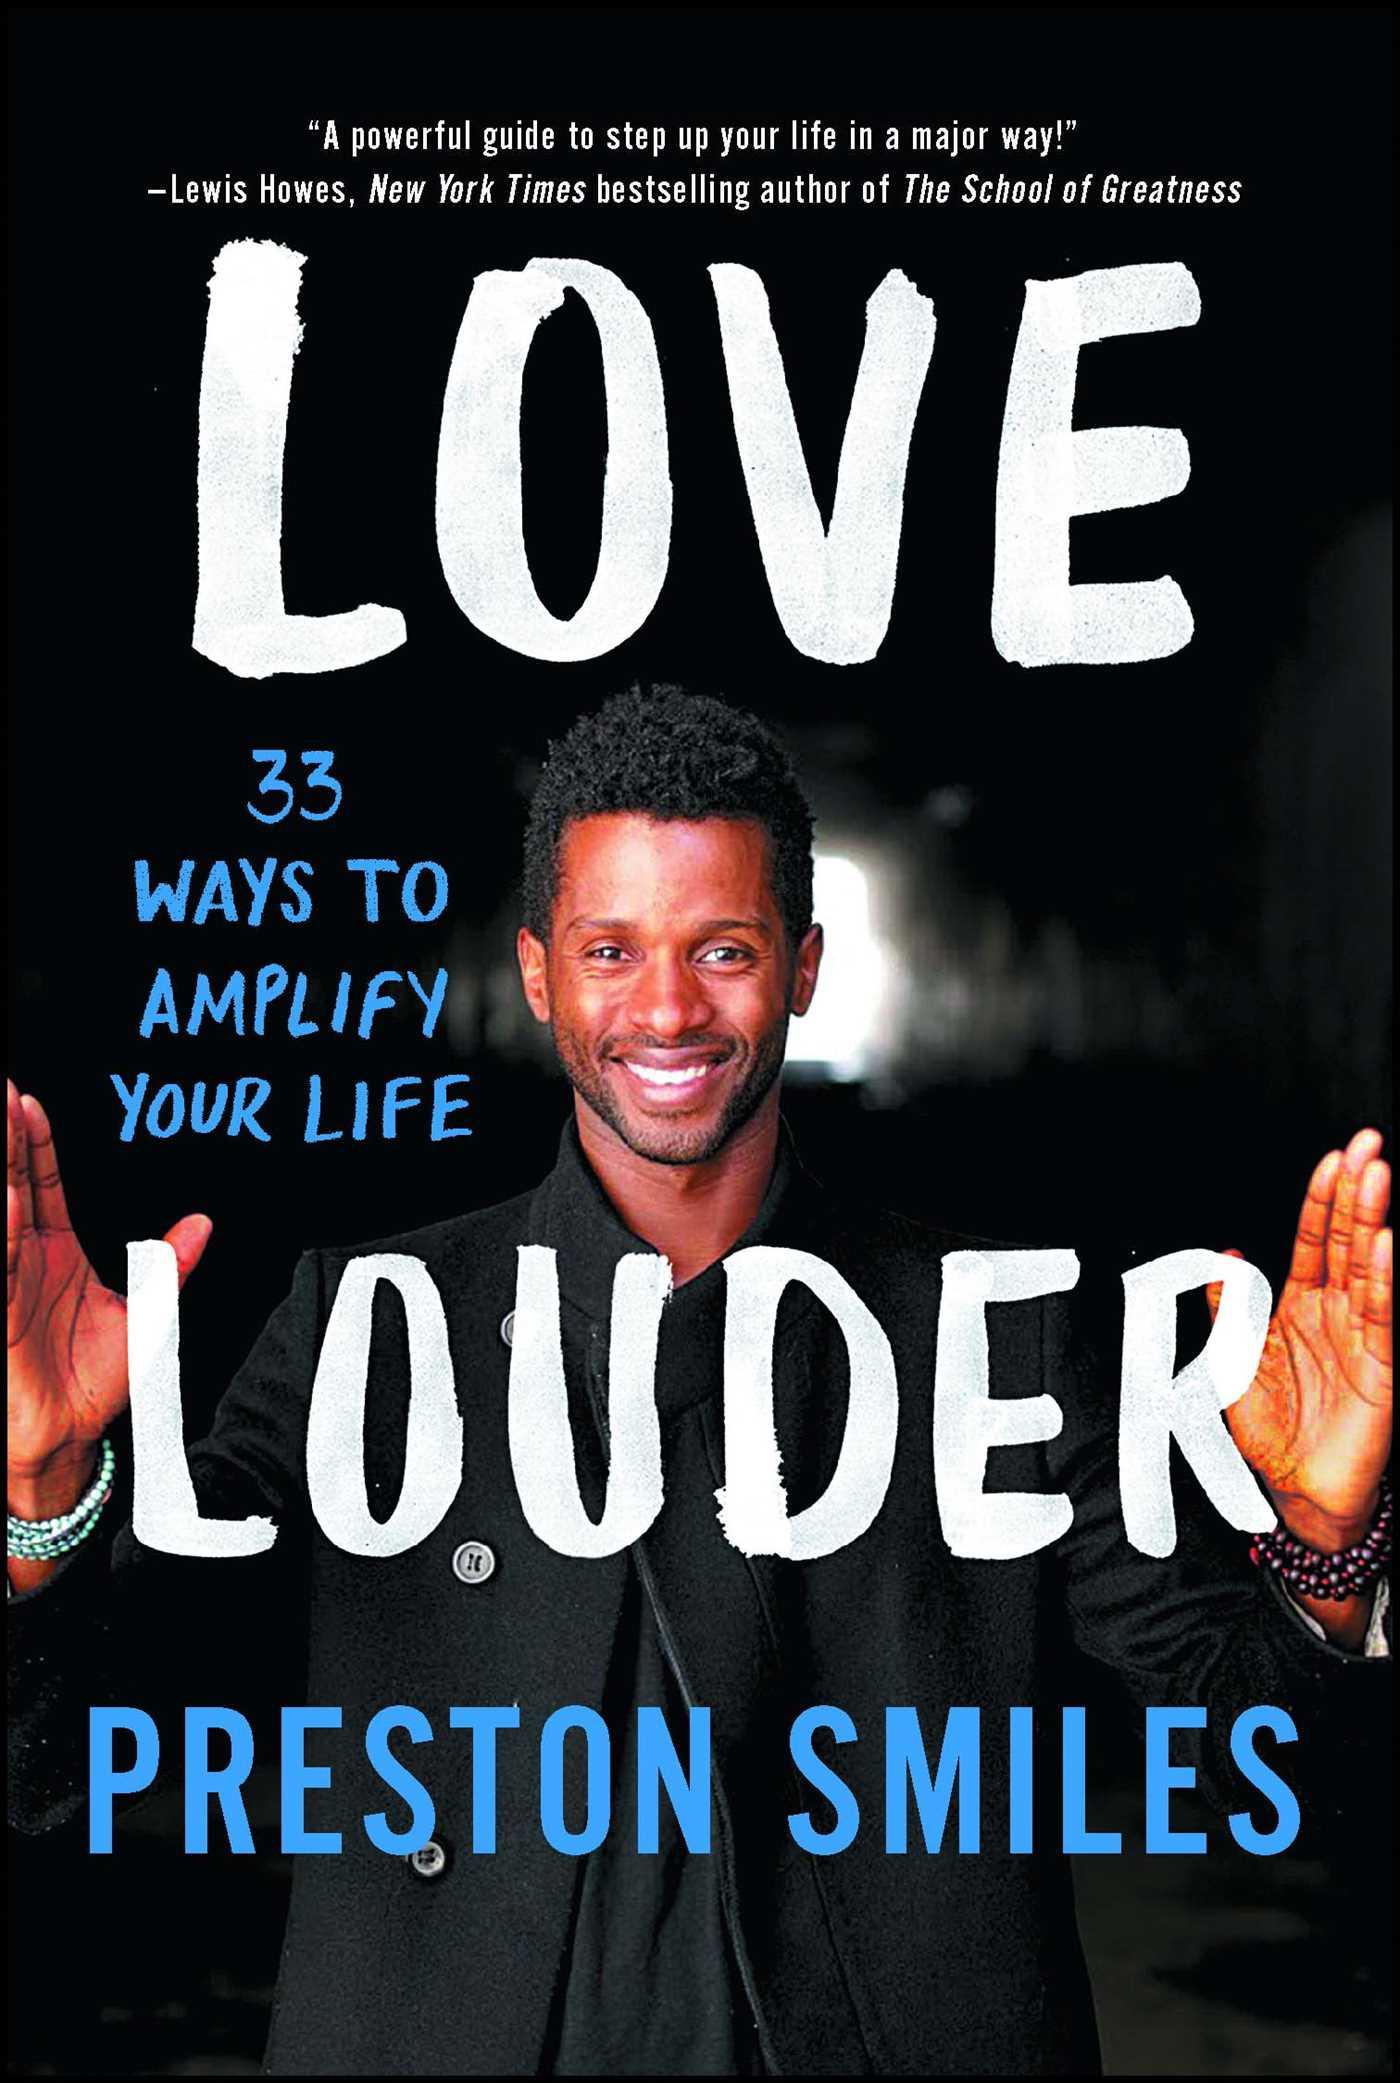 Love louder 9781501120145 hr